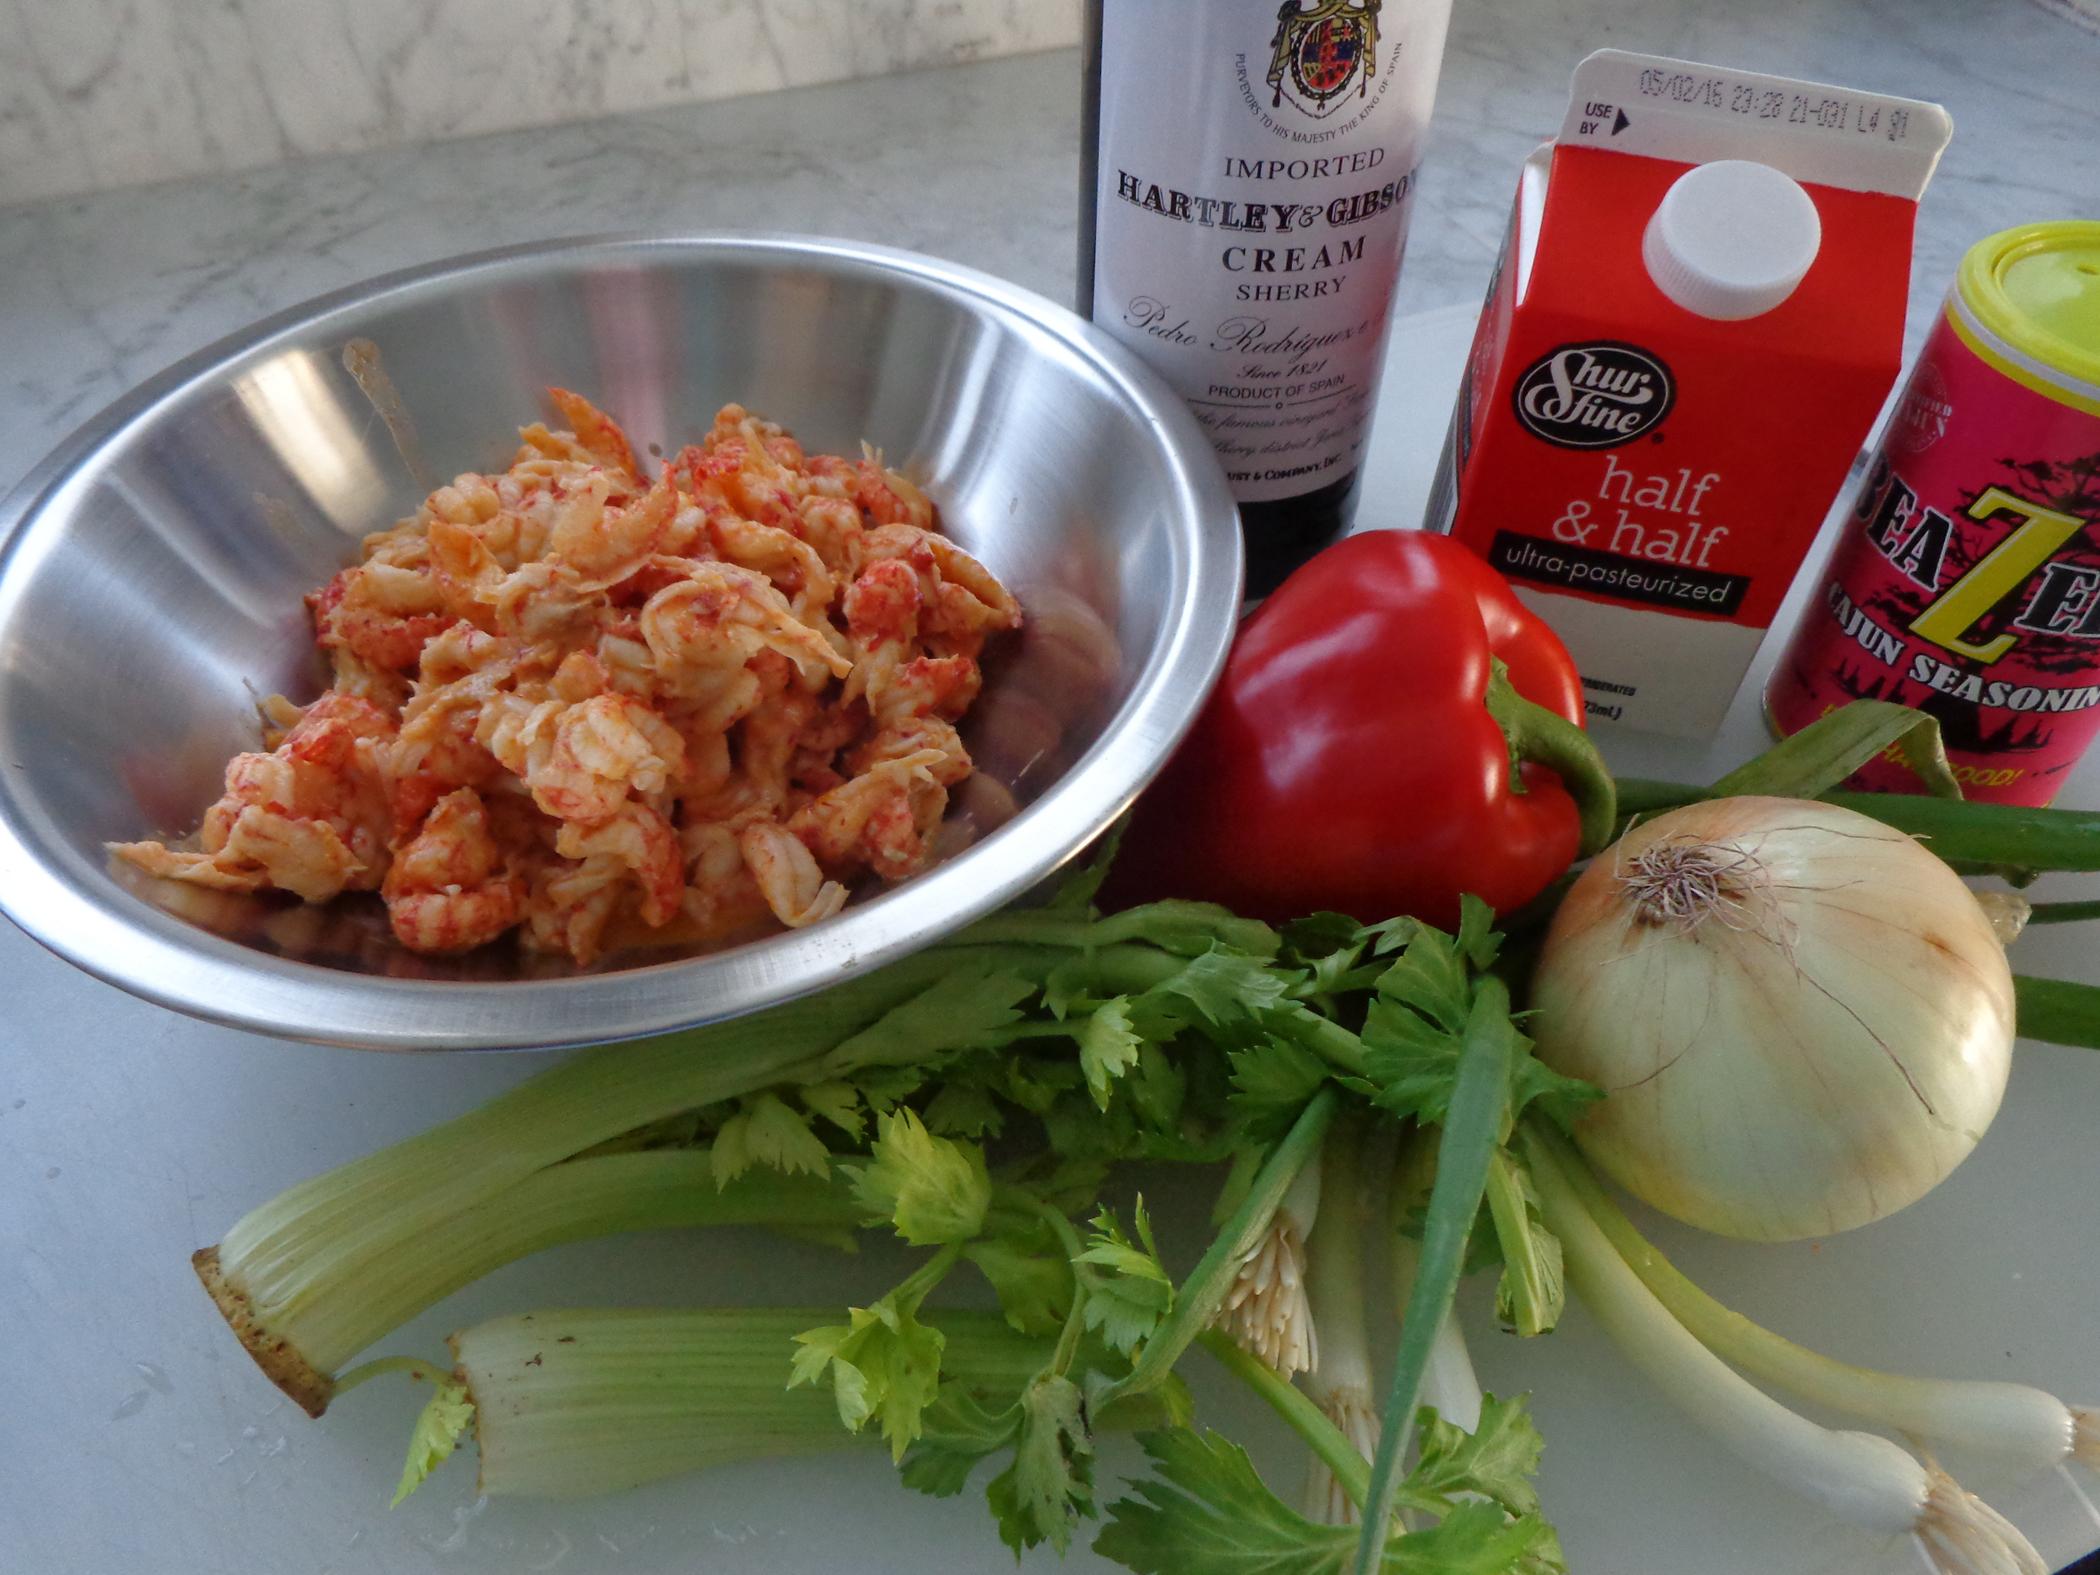 Crawfishpie Ingredients